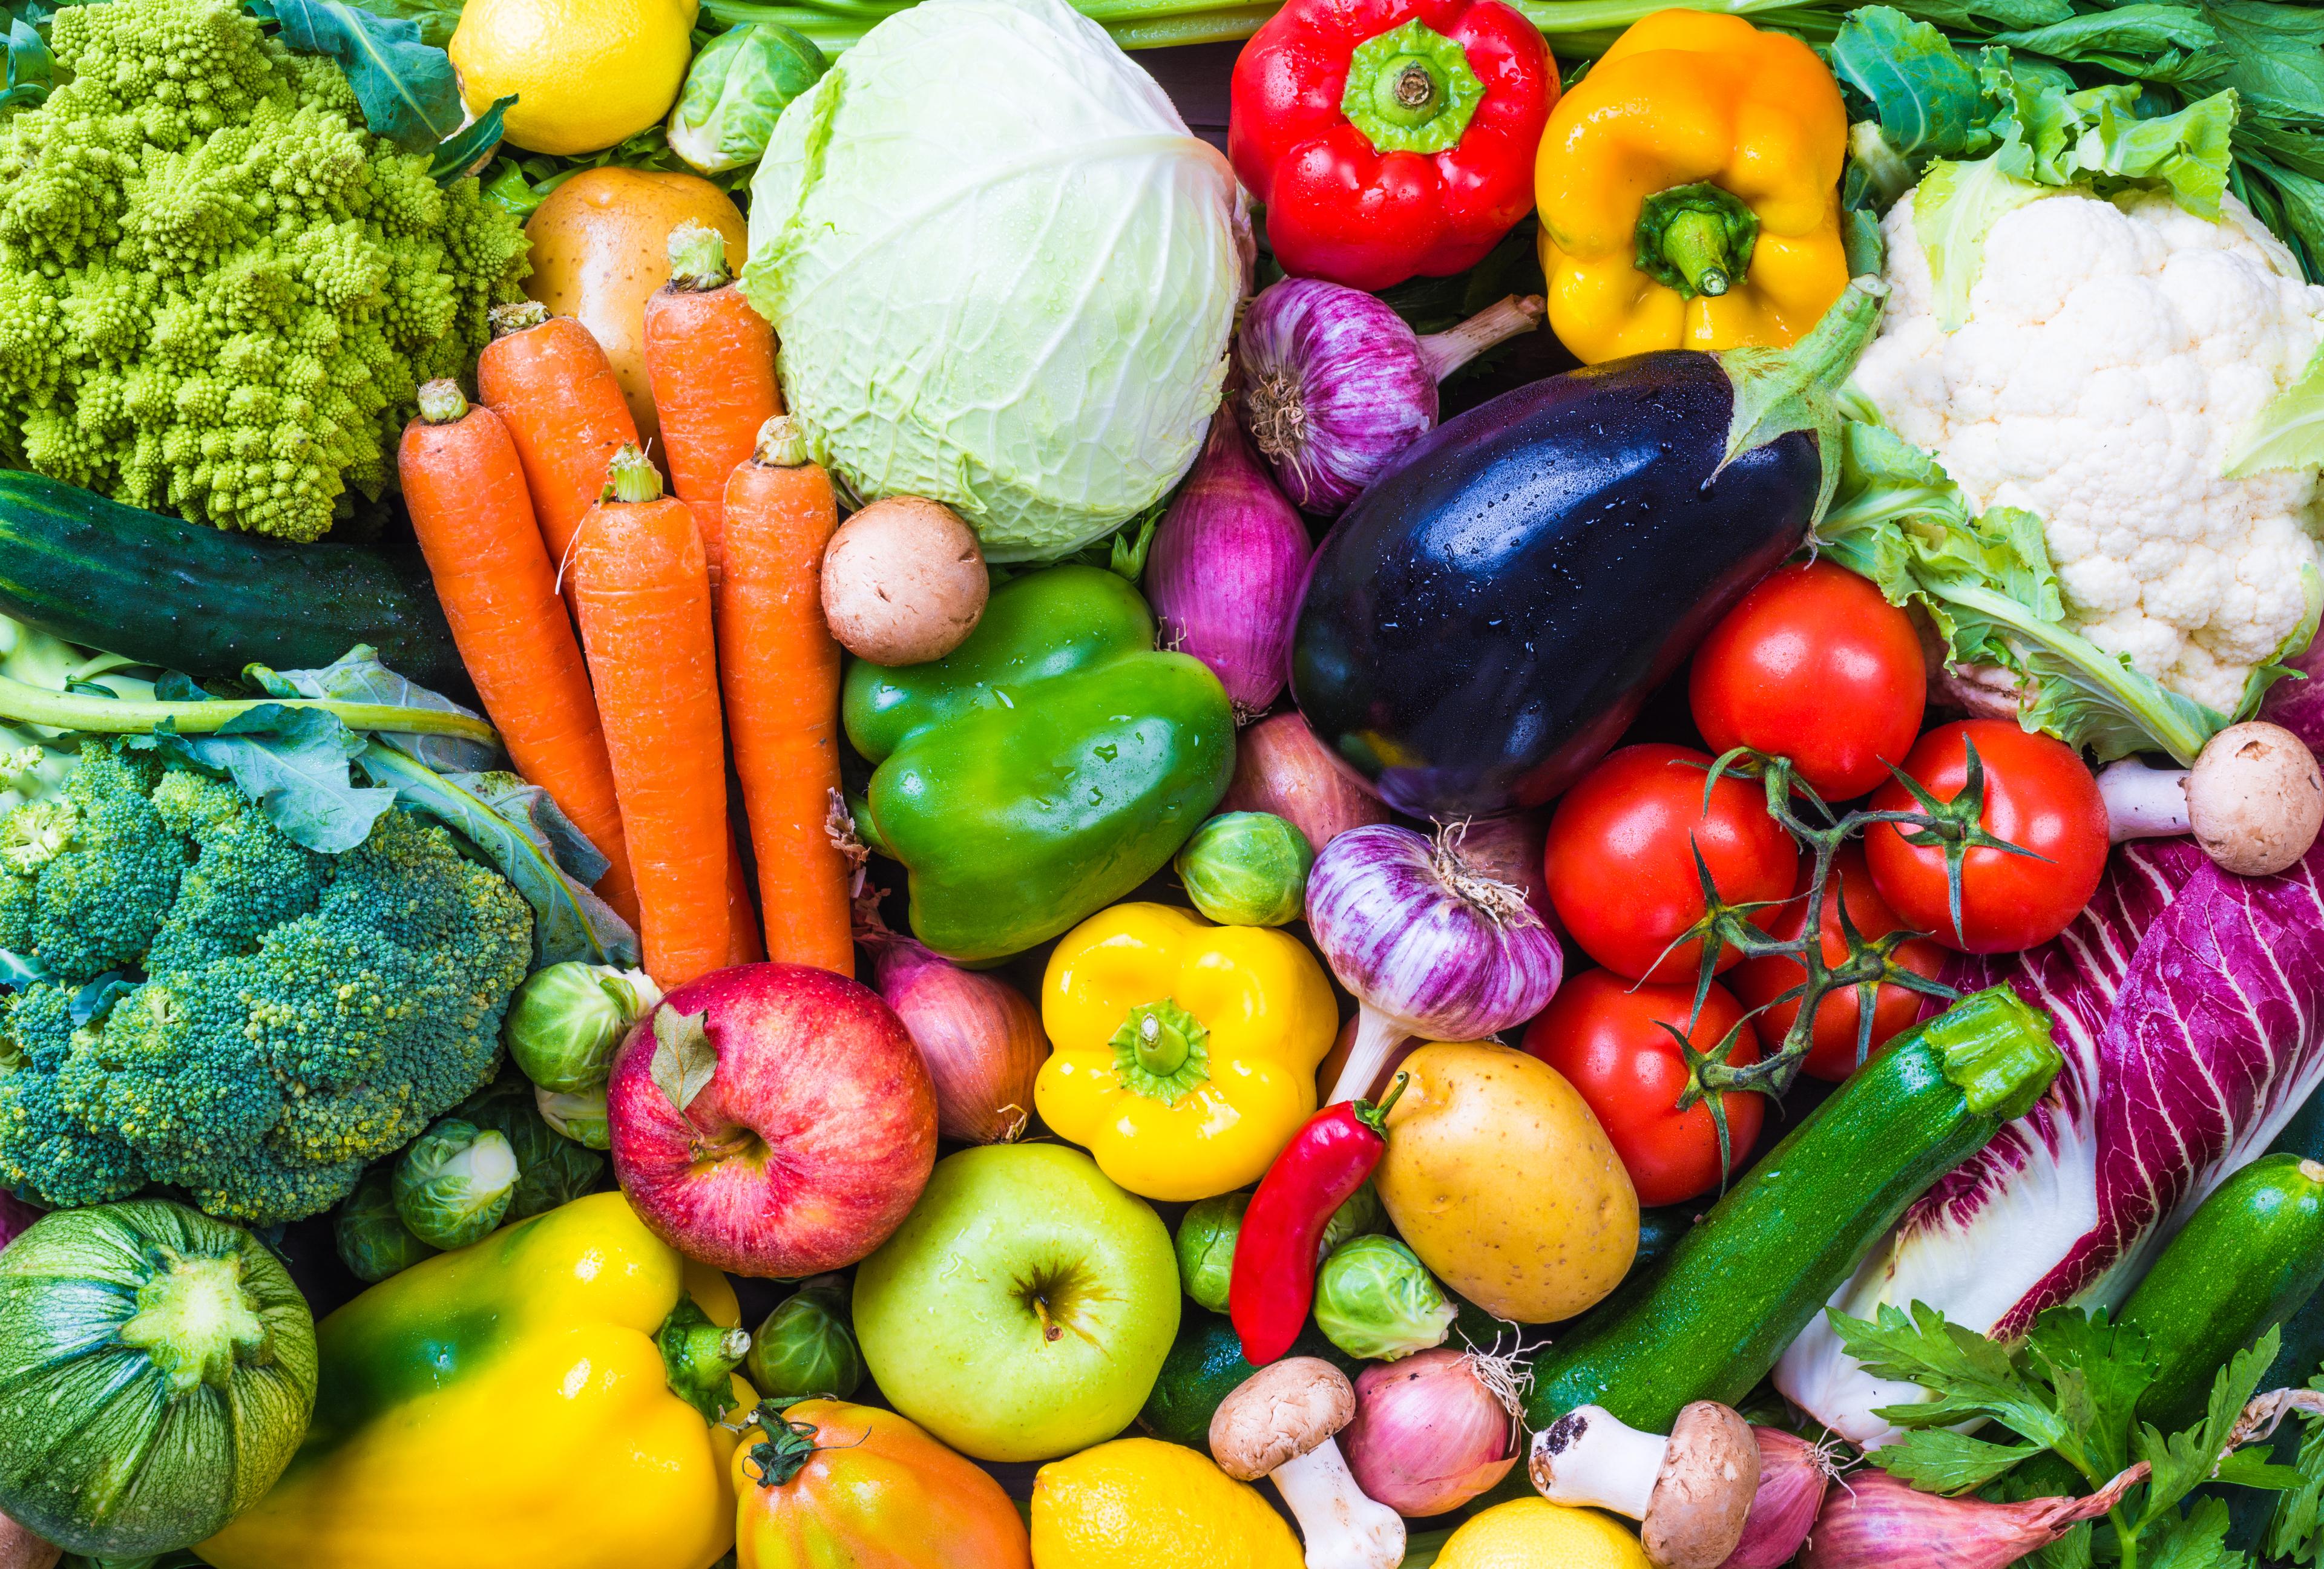 Digitalizing the Fresh Food Industry